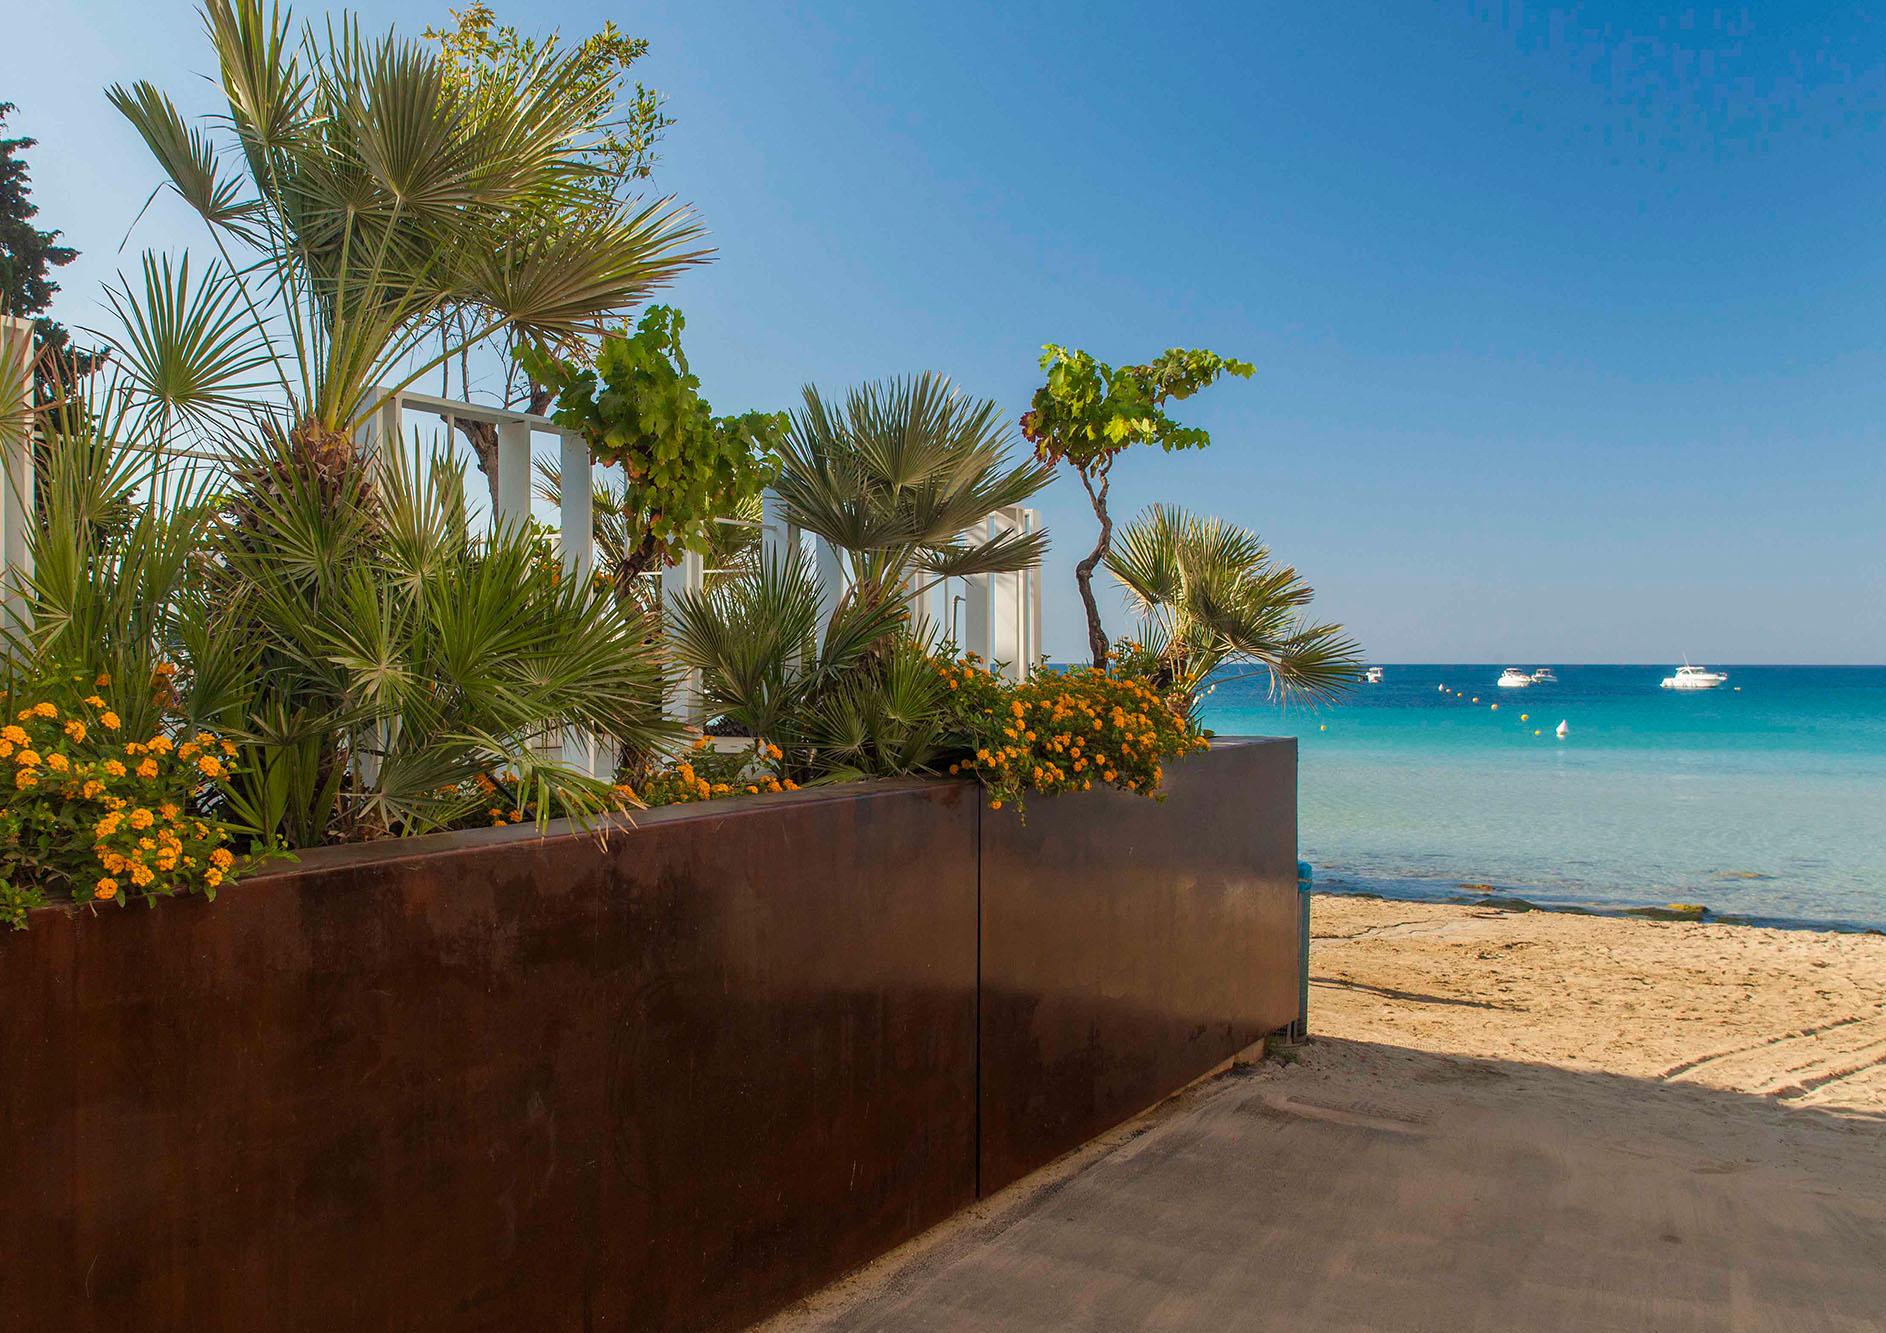 calapetra-resort-fontane-bianche-siracusa-10